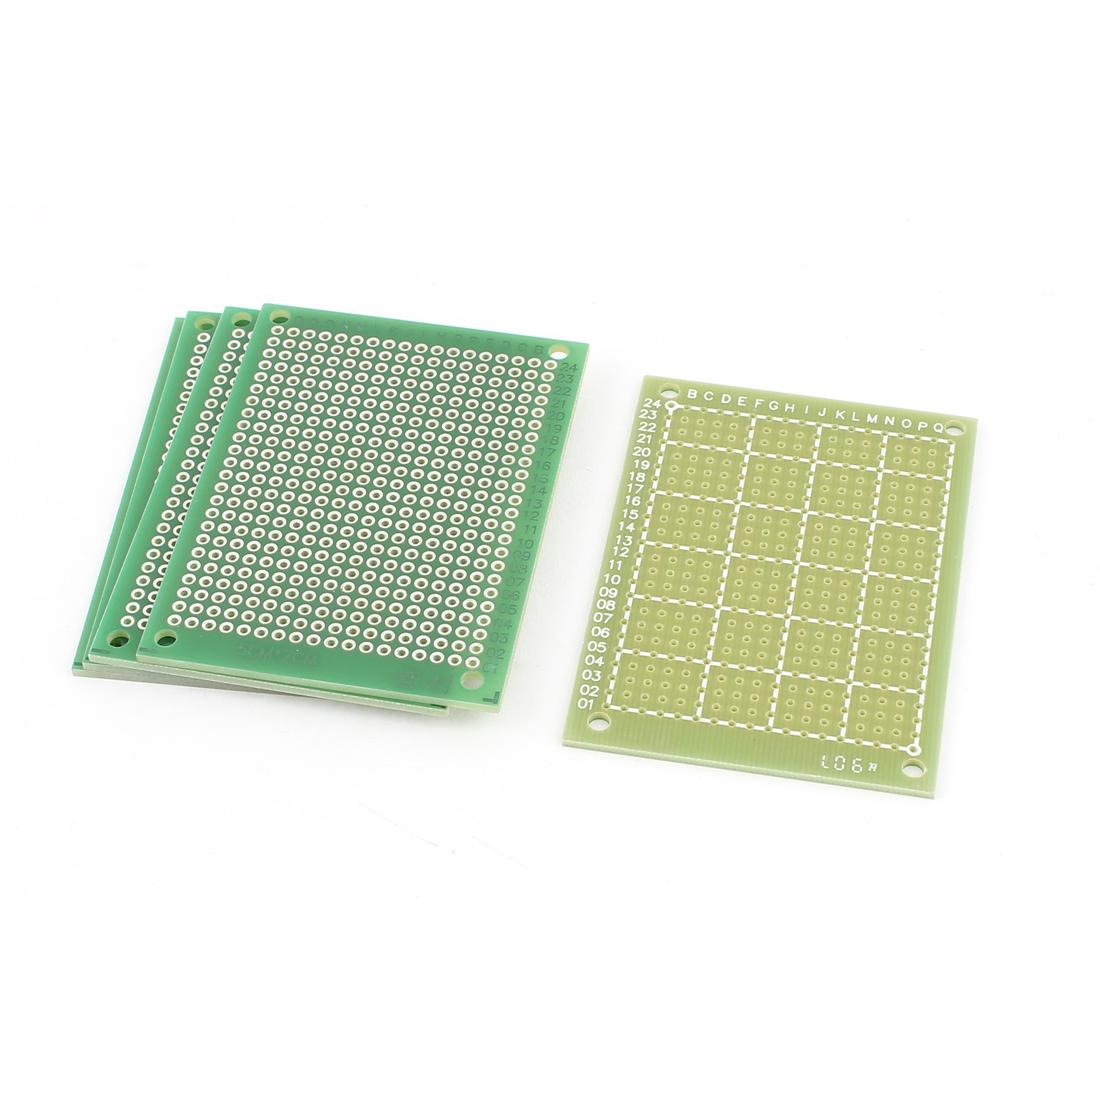 5cm x 7cm Electronic DIY Prototype Paper Single Side PCB Universal Board 5Pcs